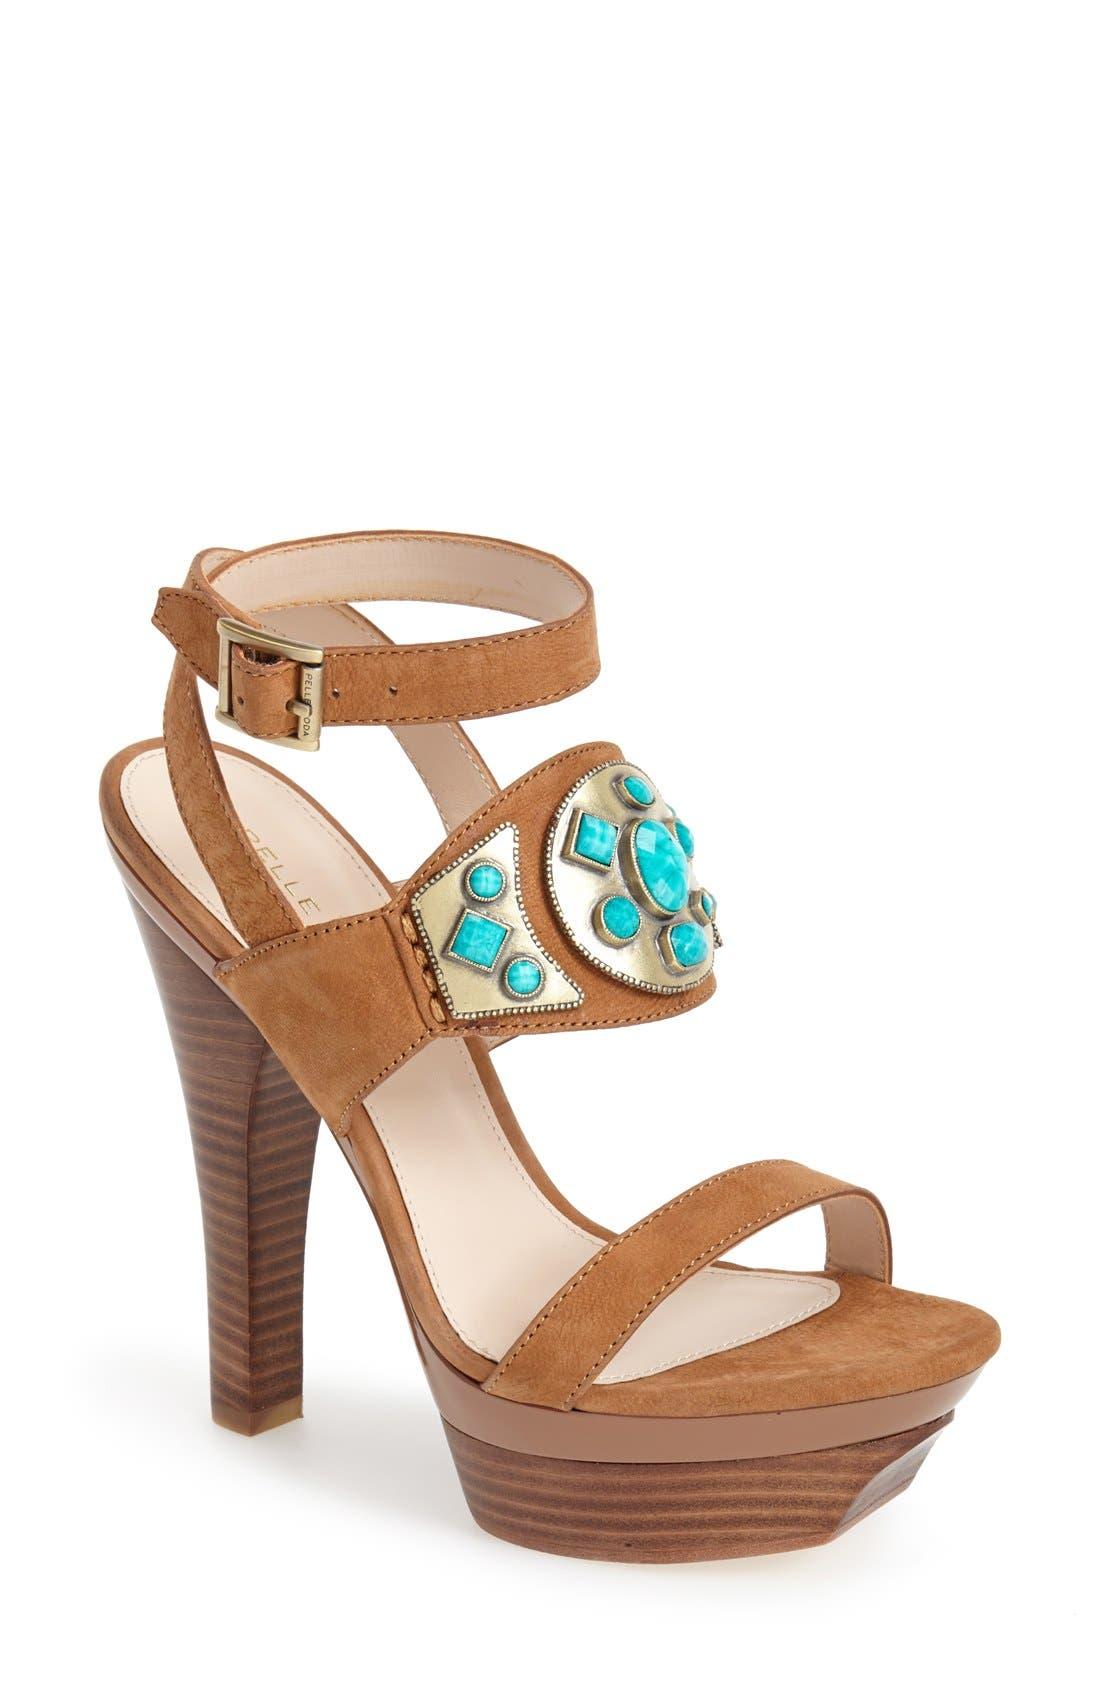 Main Image - Pelle Moda 'Cian' Jeweled Leather Ankle Strap Platform Sandal (Women)